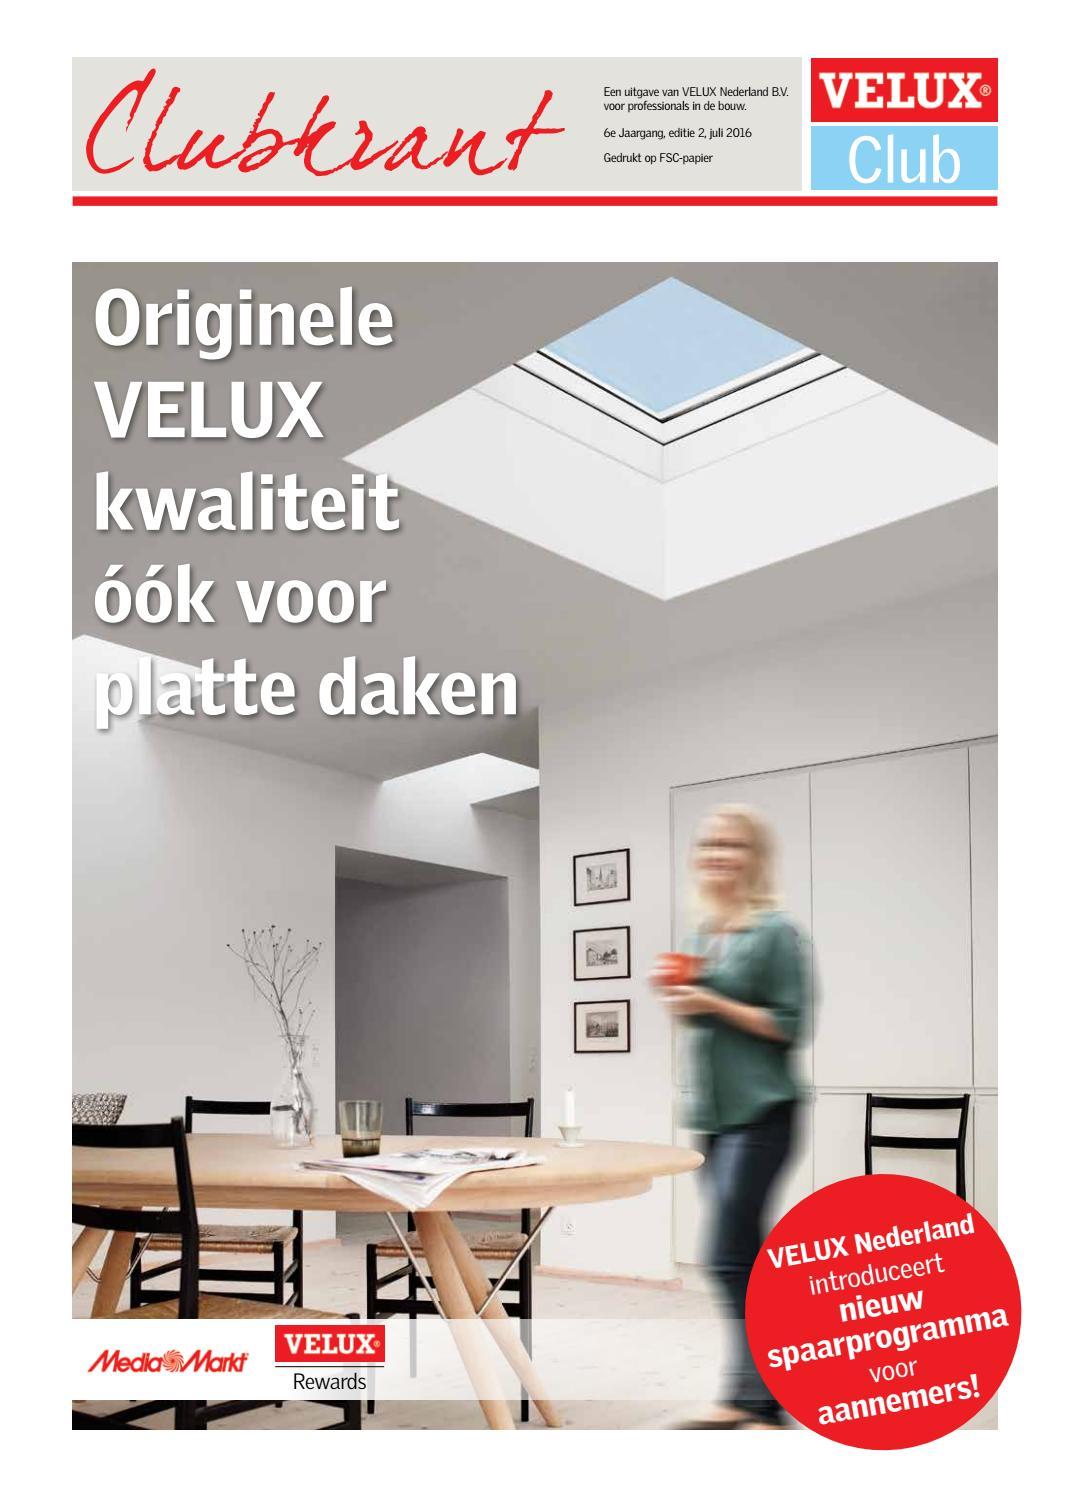 Velux clubkrant 2 2016 by velux nederland b v issuu for Velux prezzi 2016